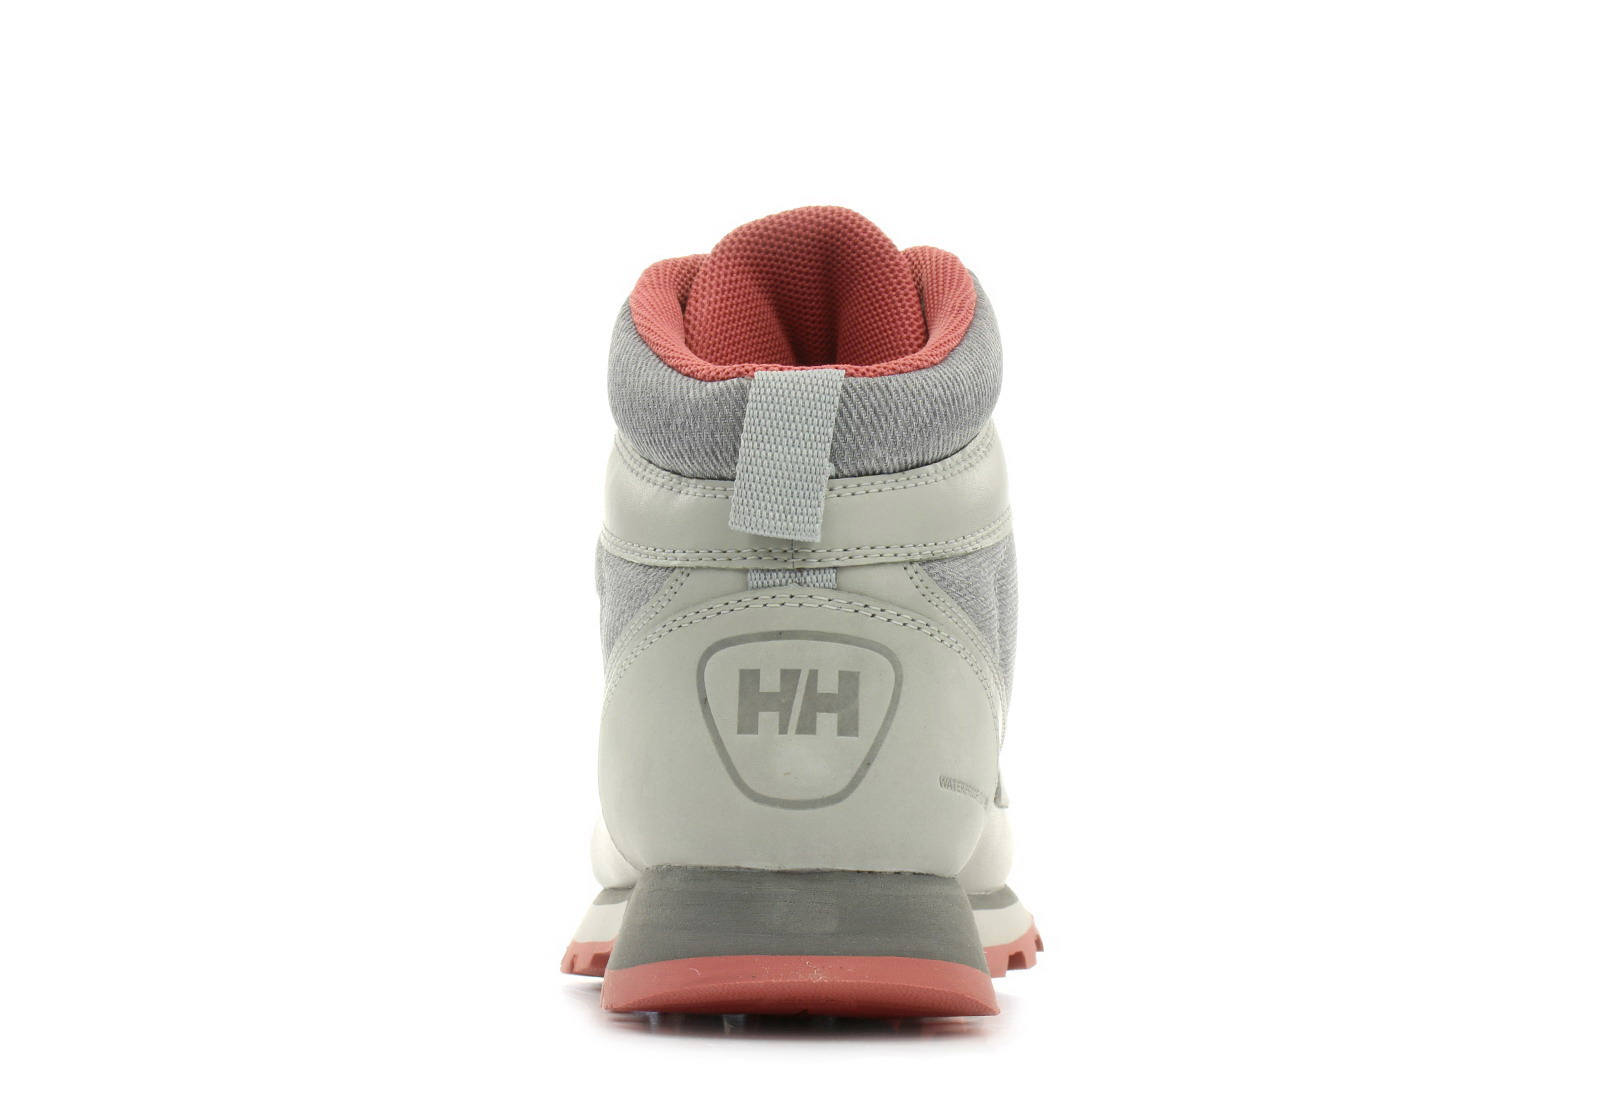 Helly Hansen Topánky - W Chilcotin - 11428-930 - Tenisky f3c4c89e114